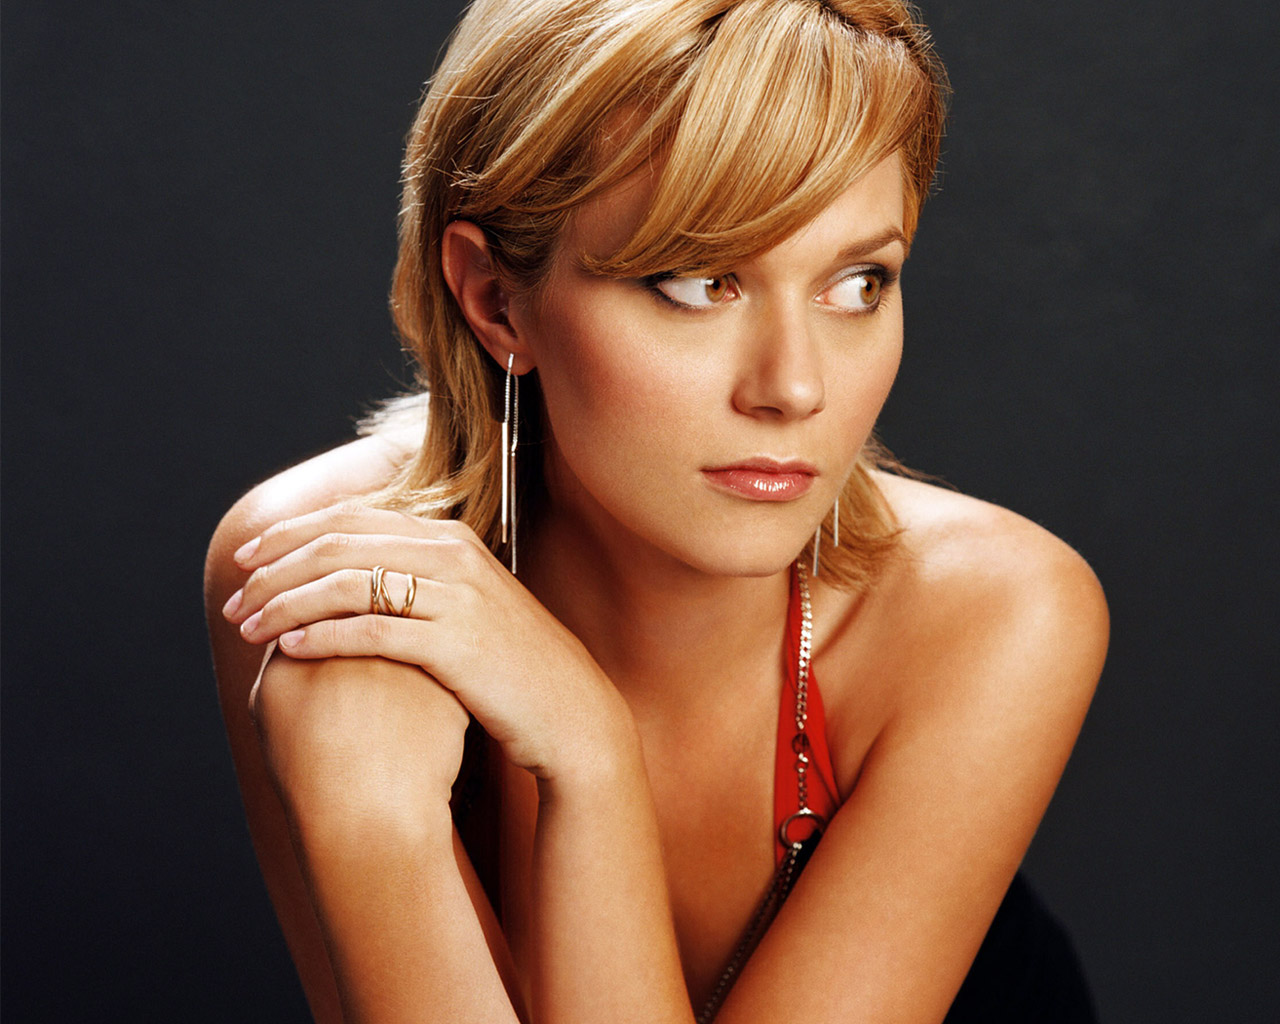 http://images.fanpop.com/images/image_uploads/Hilarie-Burton-peyton-sawyer-652474_1280_1024.jpg